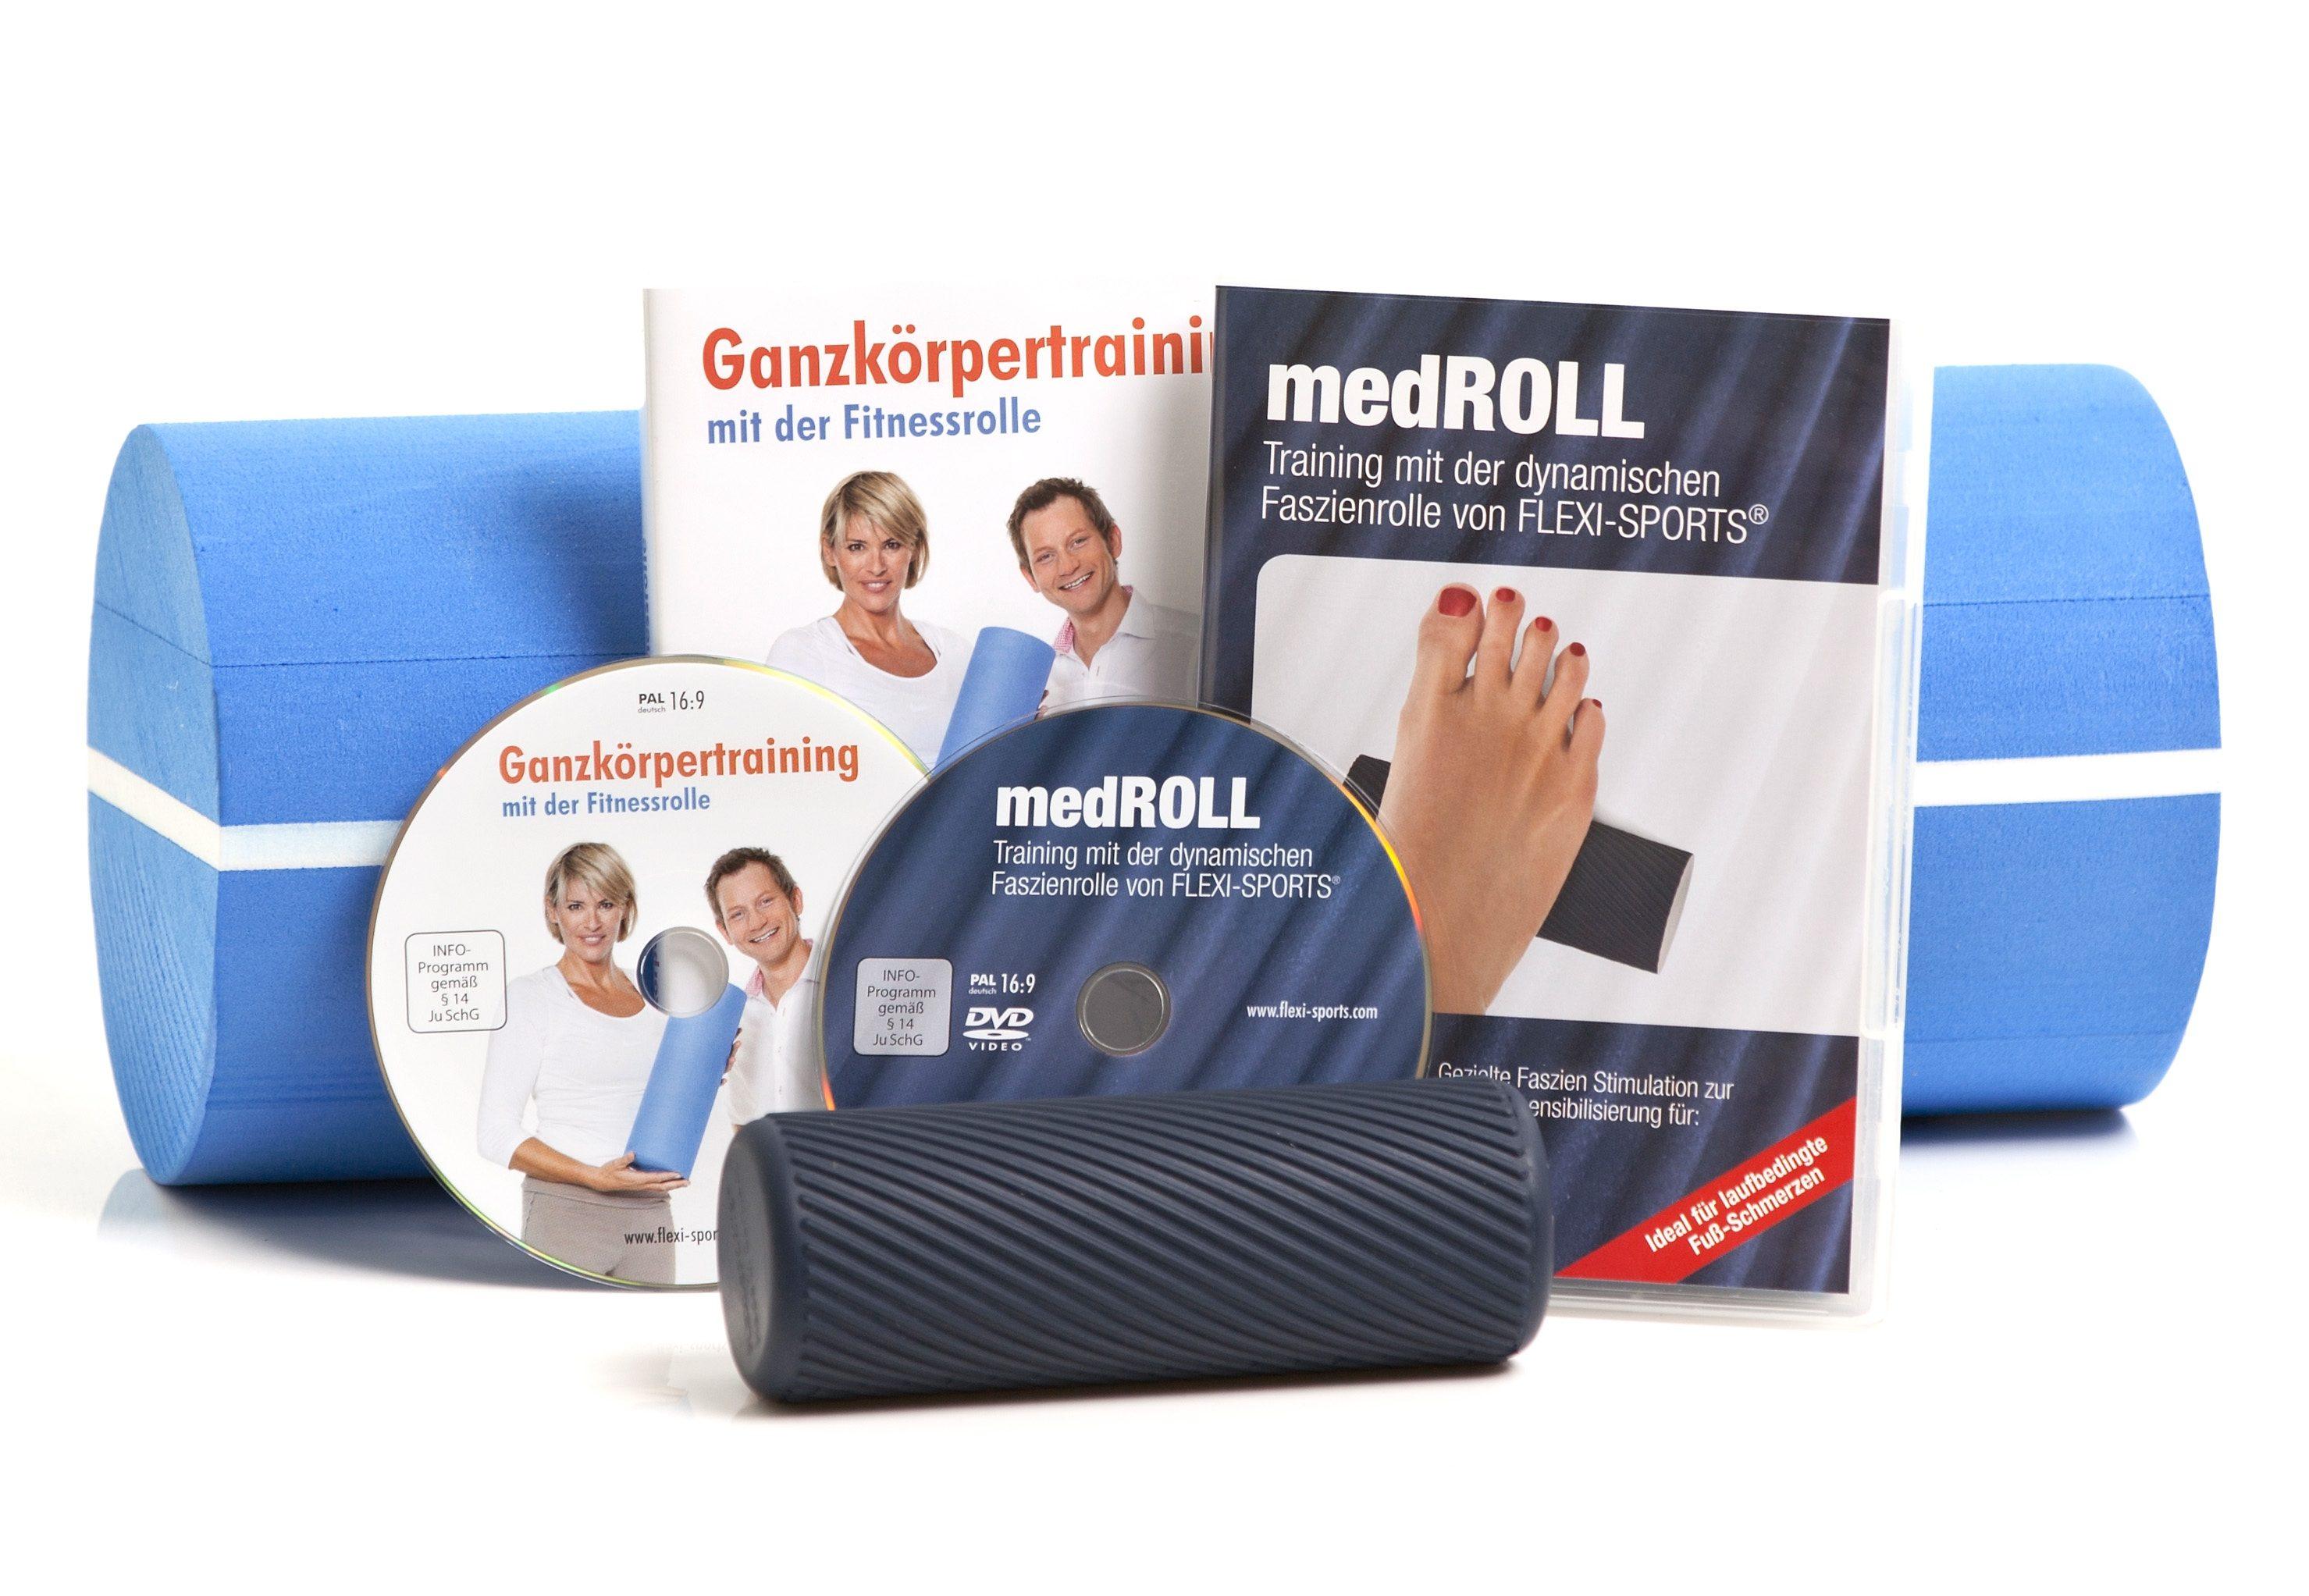 FLEXI-SPORTS Fitnessrolle Fitnessrolle + medROLL inkl DVDs (Set 4-tlg) Technik & Freizeit/Sport & Freizeit/Fitnessgeräte/Fitness-Kleingeräte/Massagerollen